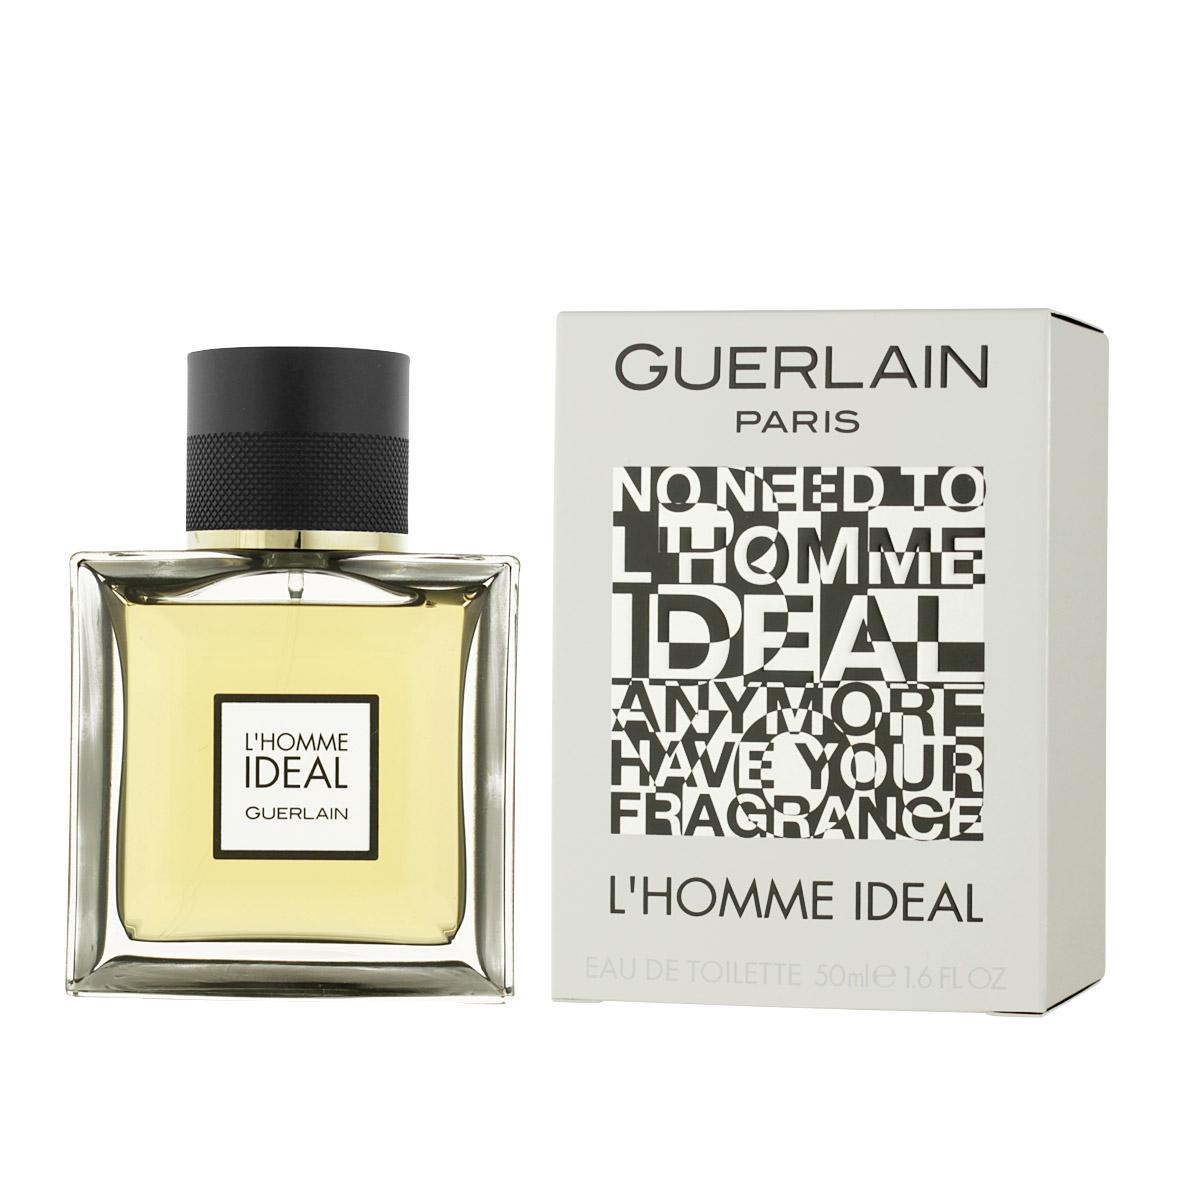 Guerlain L'Homme Ideal EDT 50 ml M